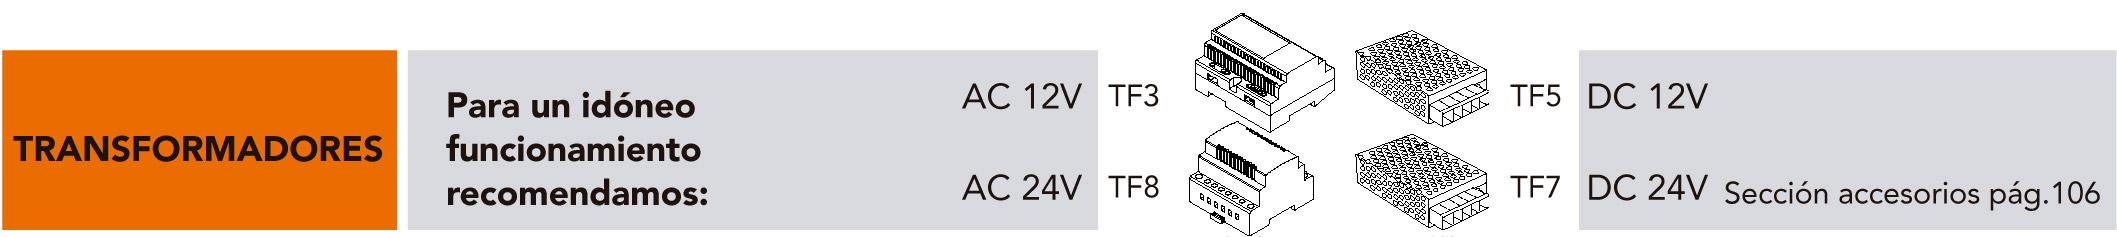 S47-46-84_transformadores